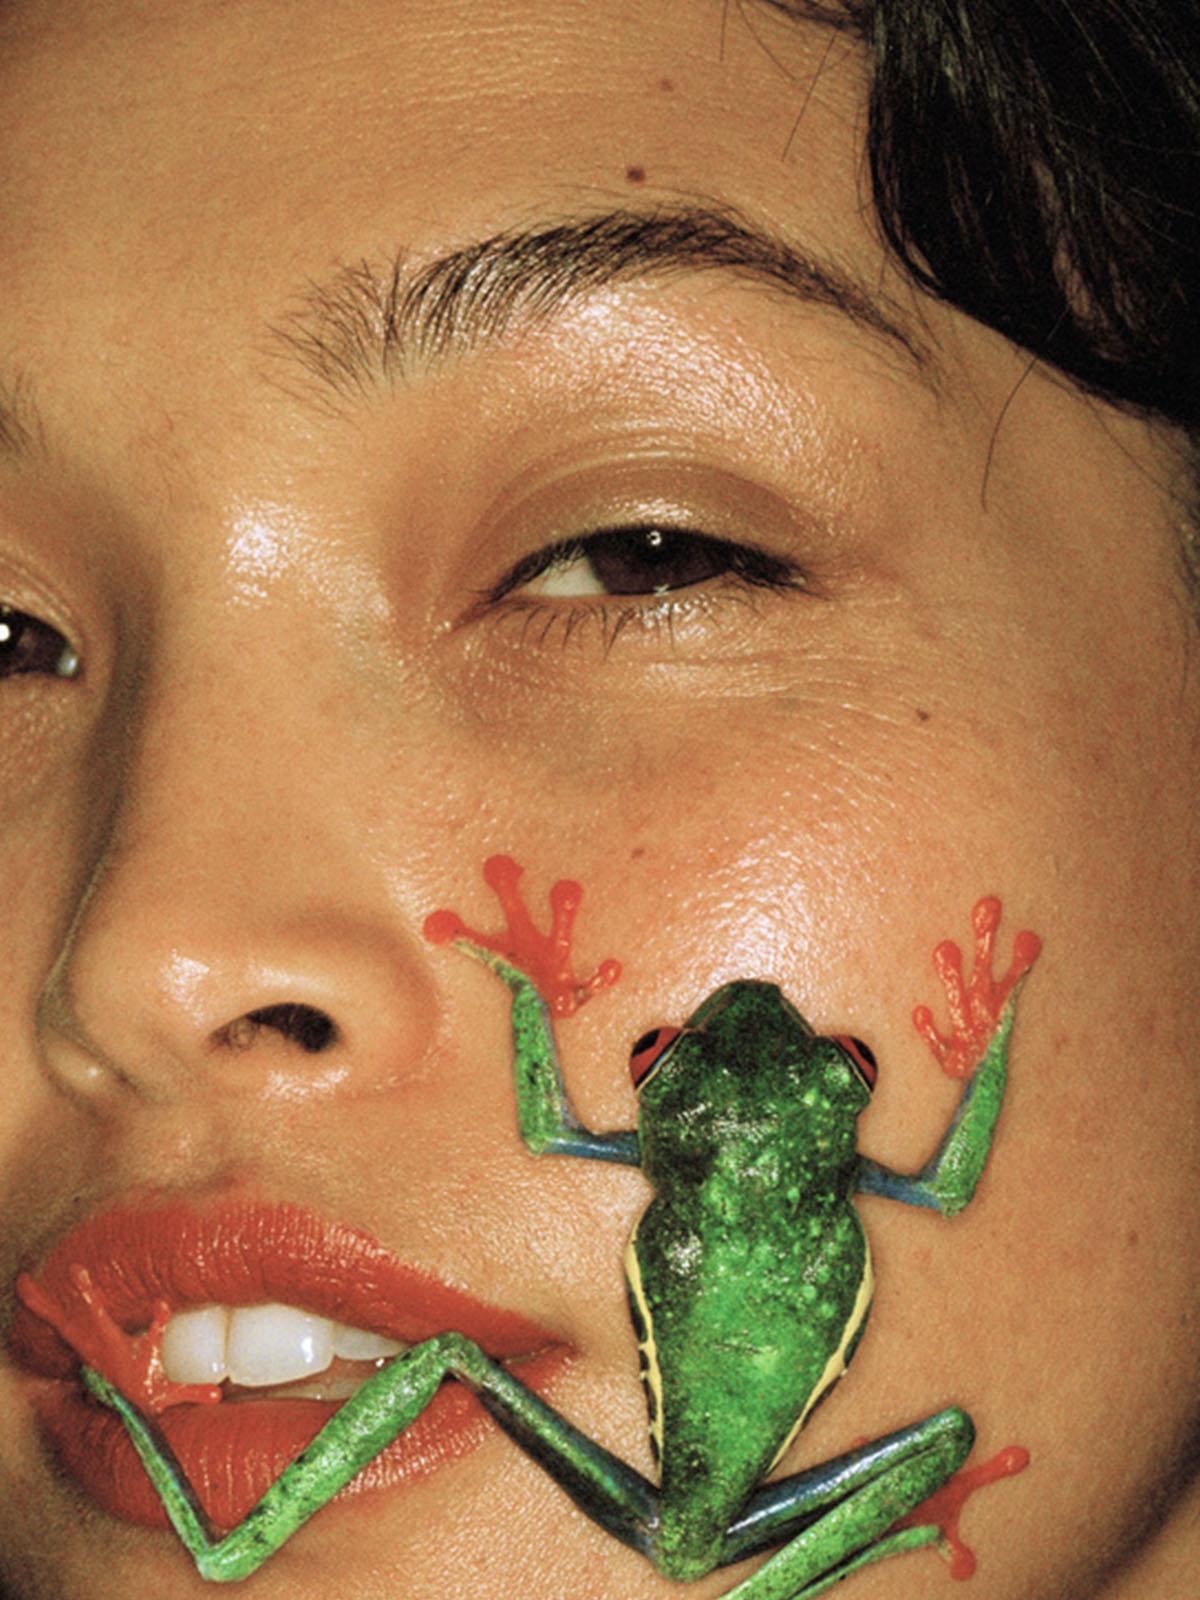 Photographer Jason Landis explores the intimacies of evolution